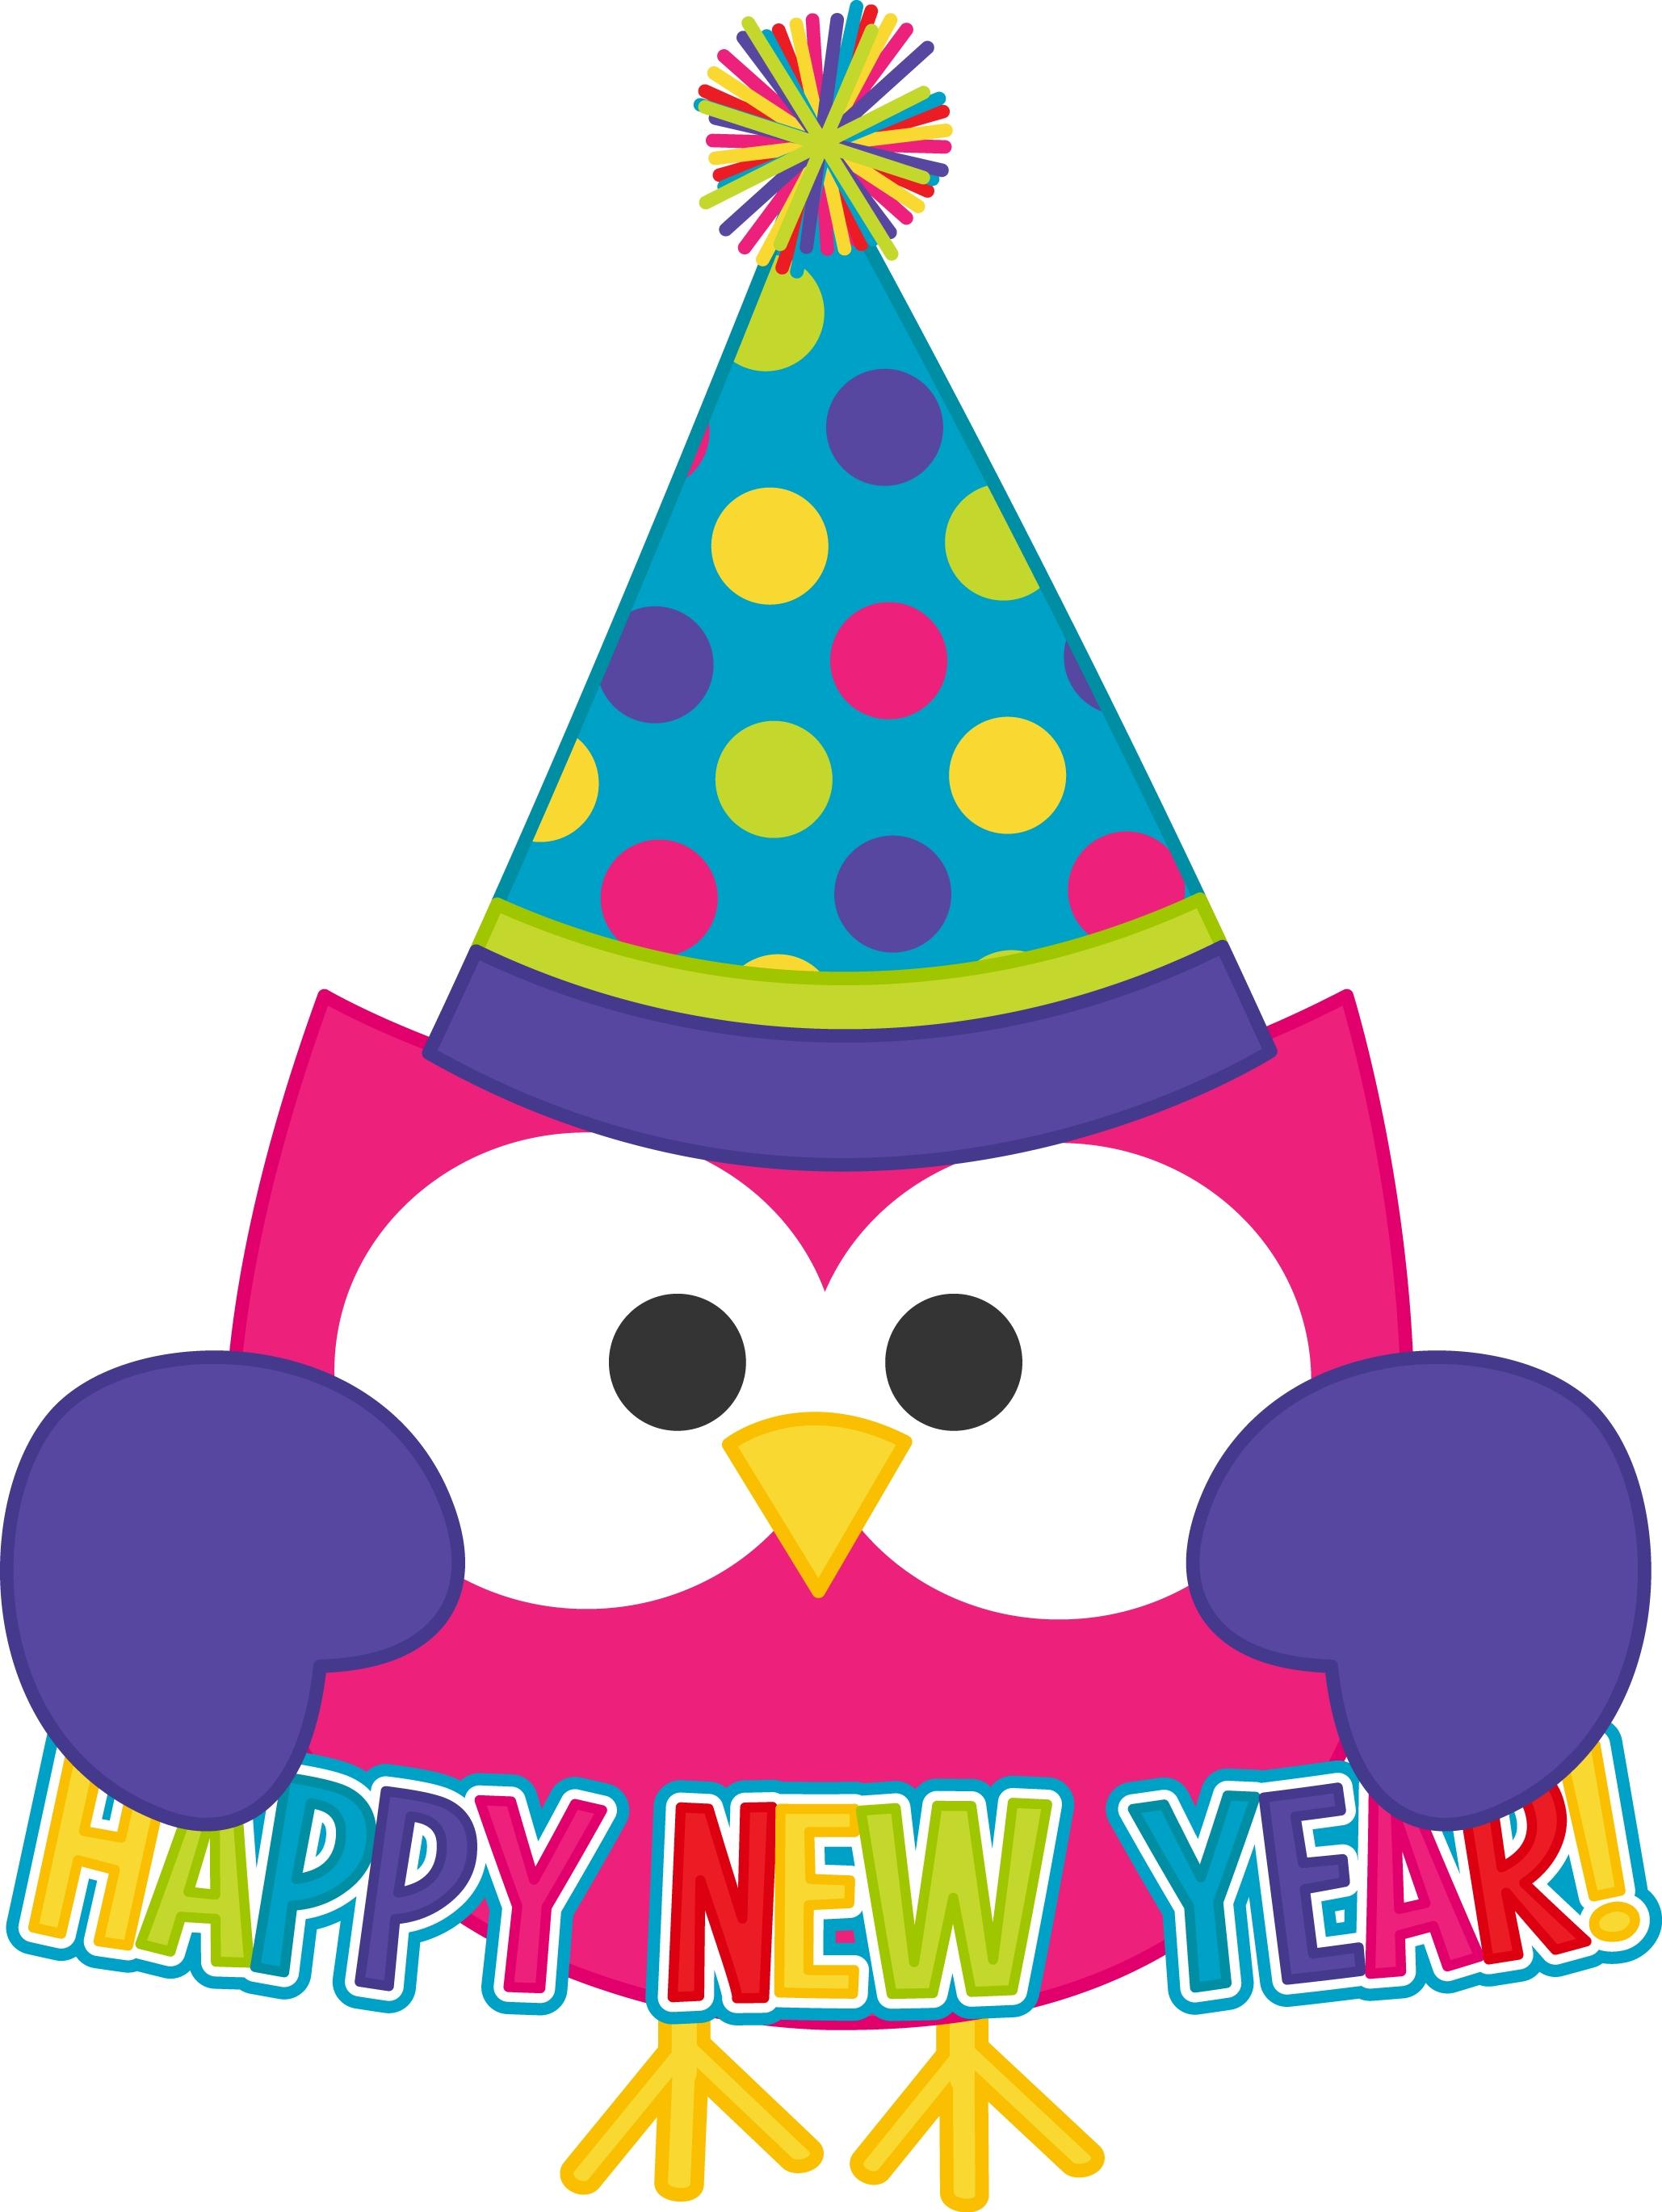 Happy New Year 2017 Free Cute .-Happy New Year 2017 Free Cute .-10